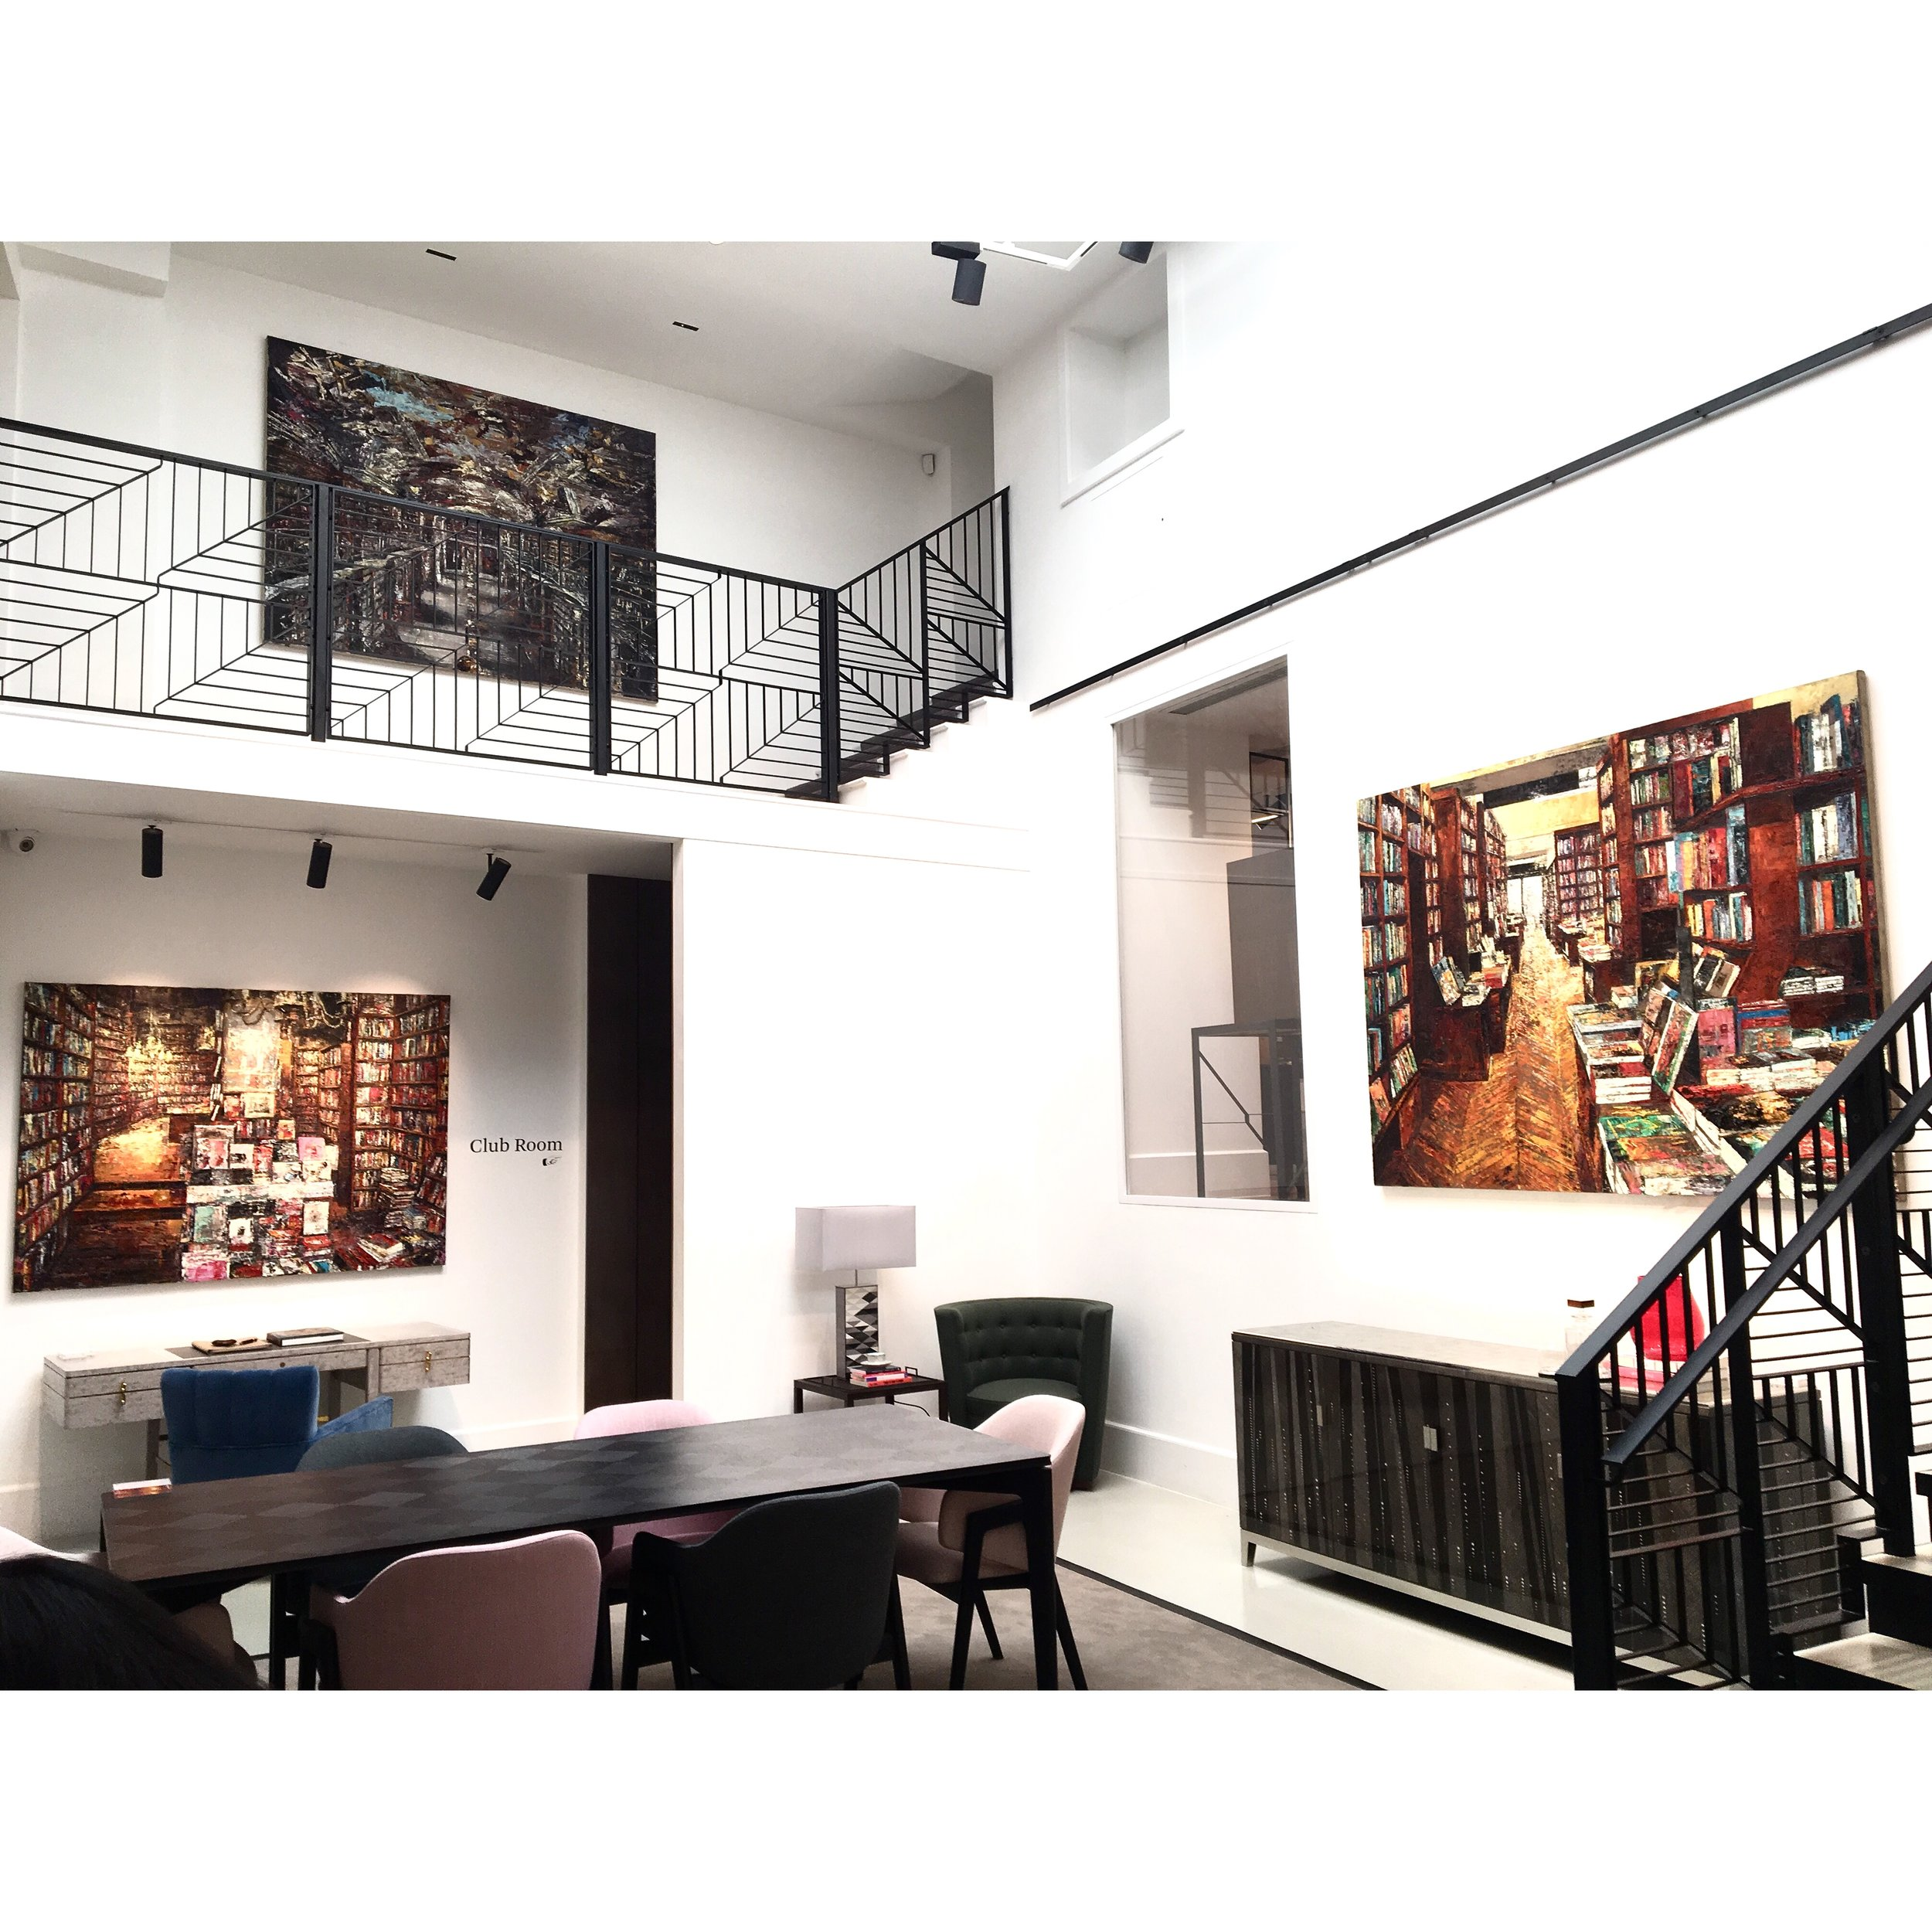 Massimo-Giannoni-Exhibition-Photo-6-Linley-London-Ransom-Art-Collaboration.jpg